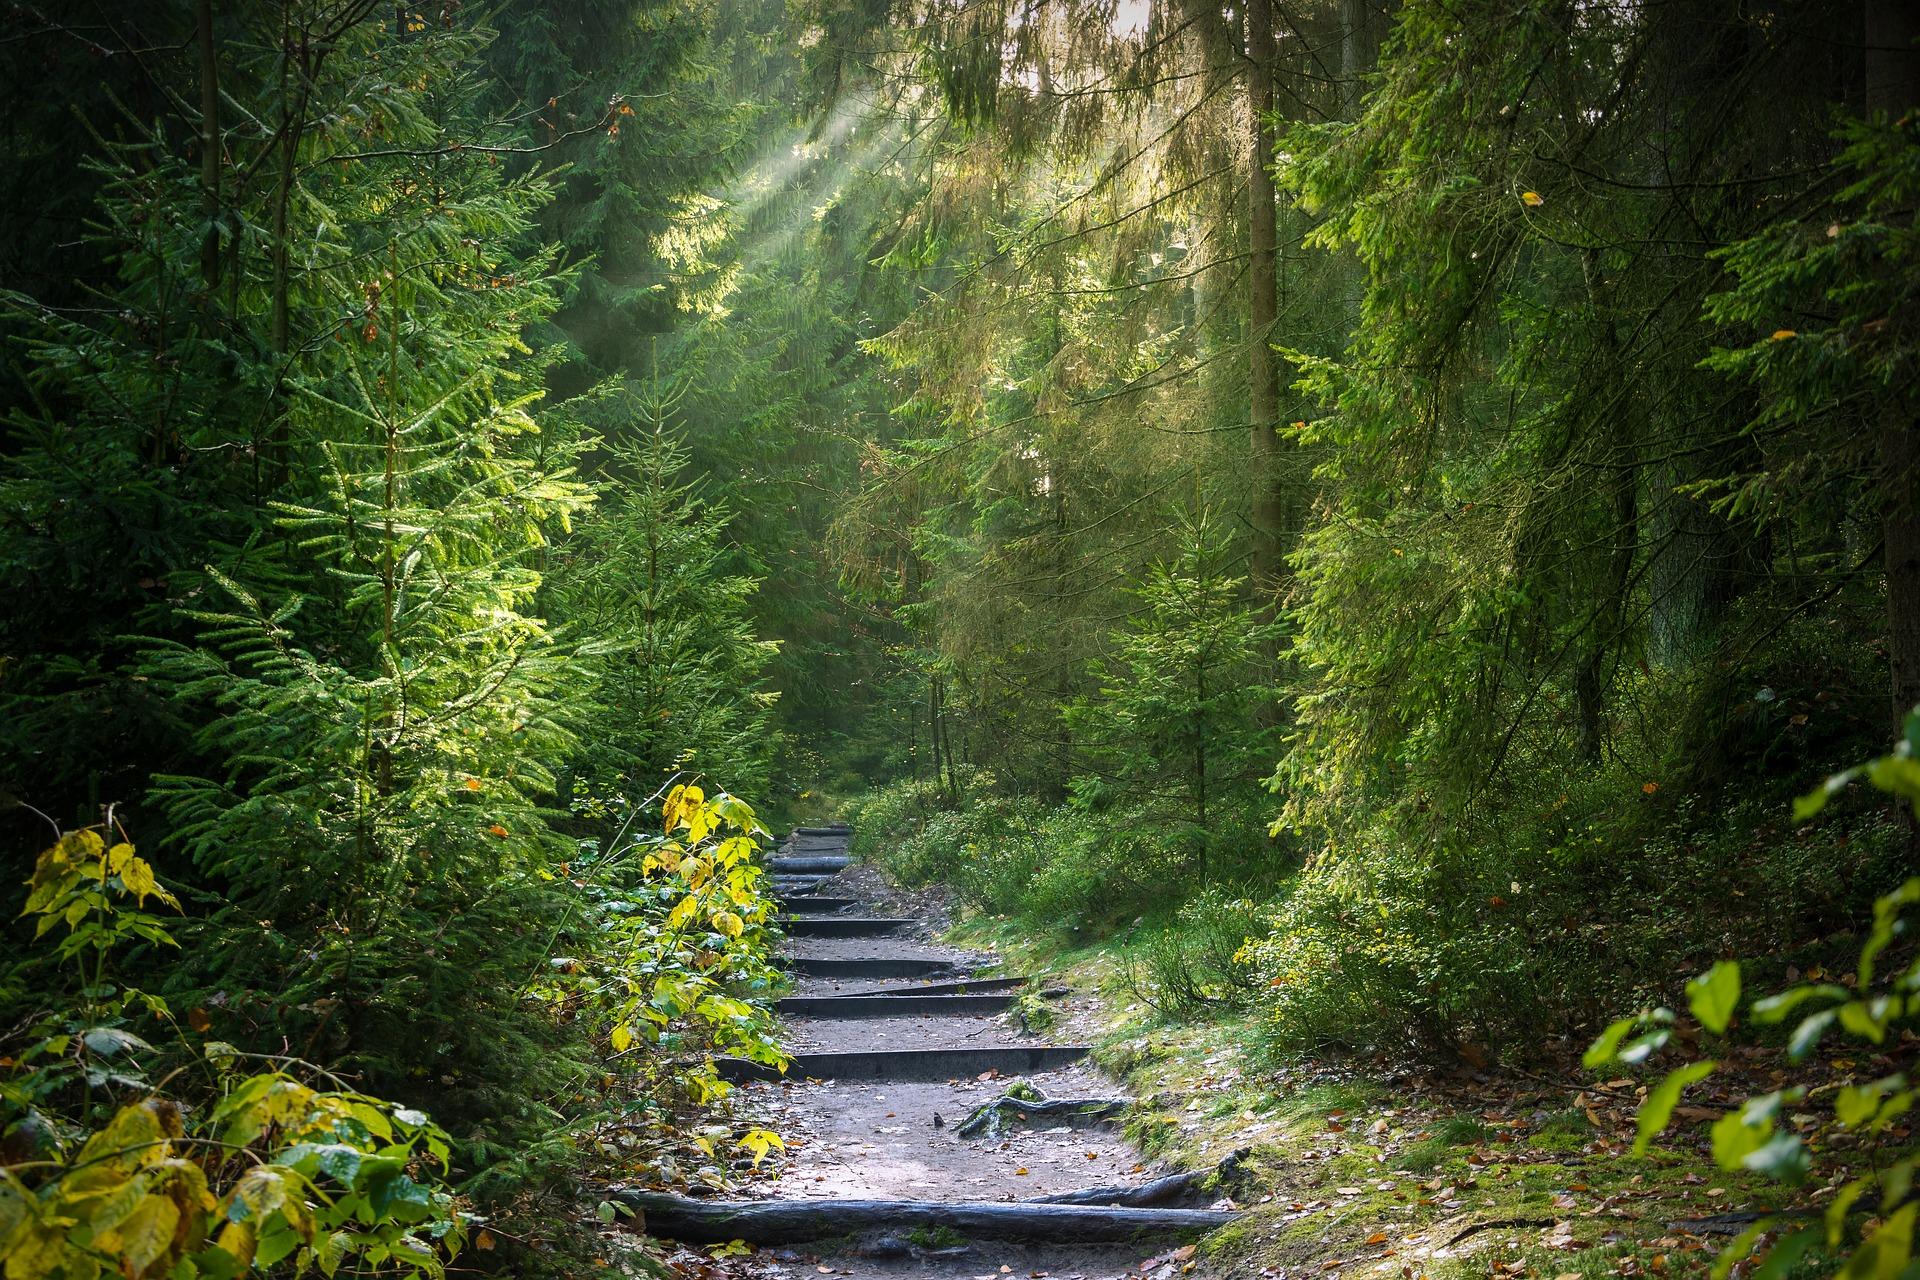 Tag im Wald Traumreise Text Skript Meditation